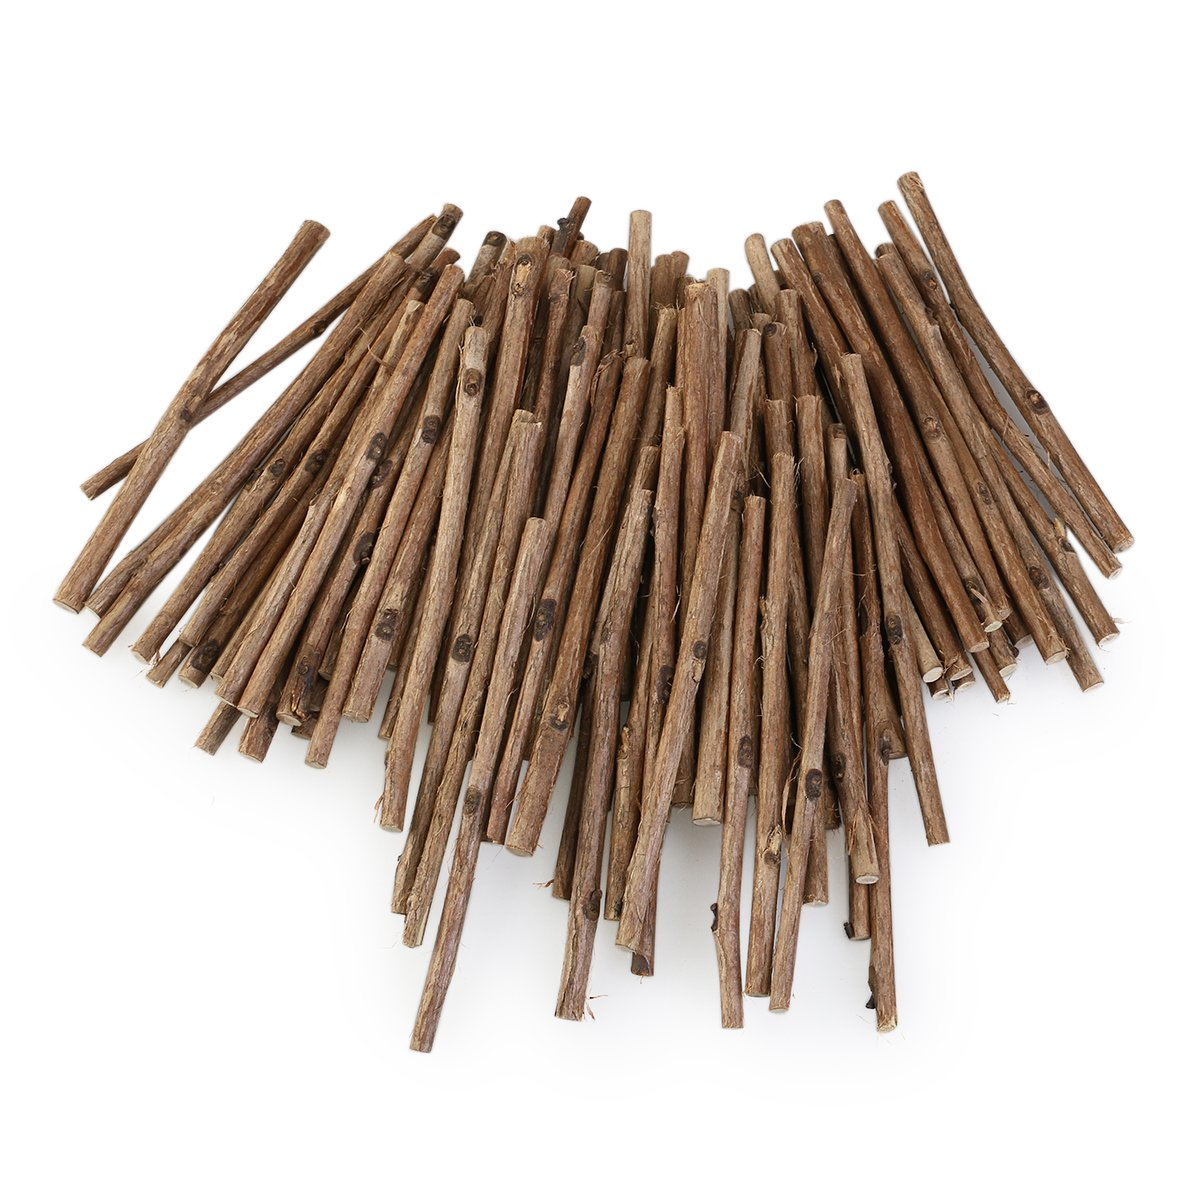 OULII Wood Sticks Log Sticks for DIY Crafts Photo Props 4inch Pack of 100